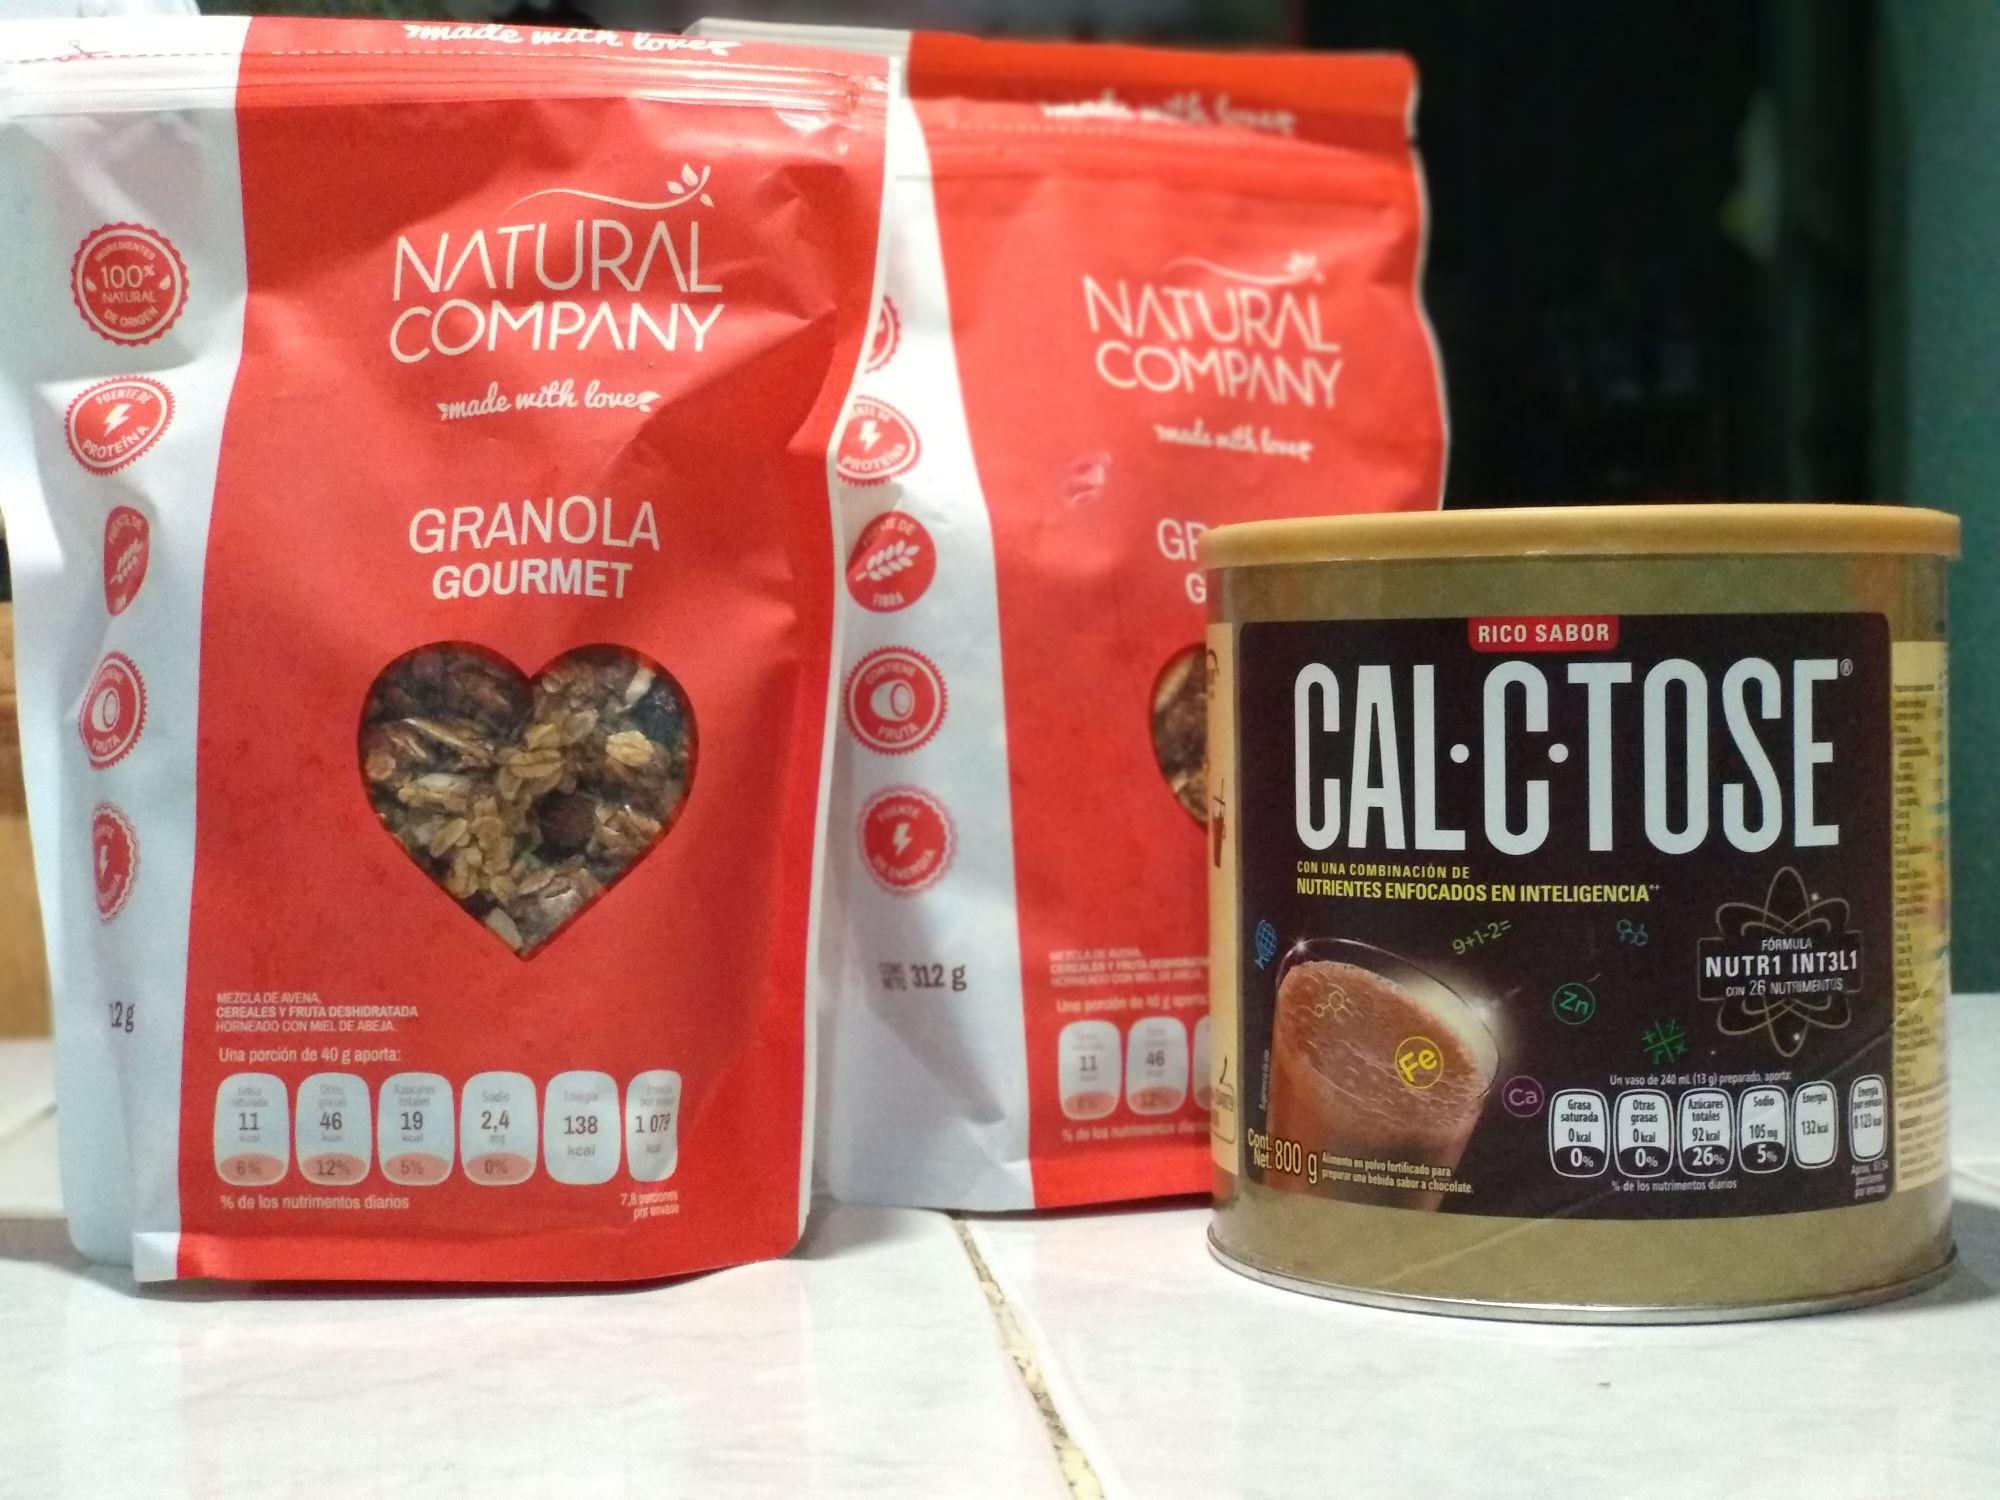 Walmart: Granola Gourmet 17.01